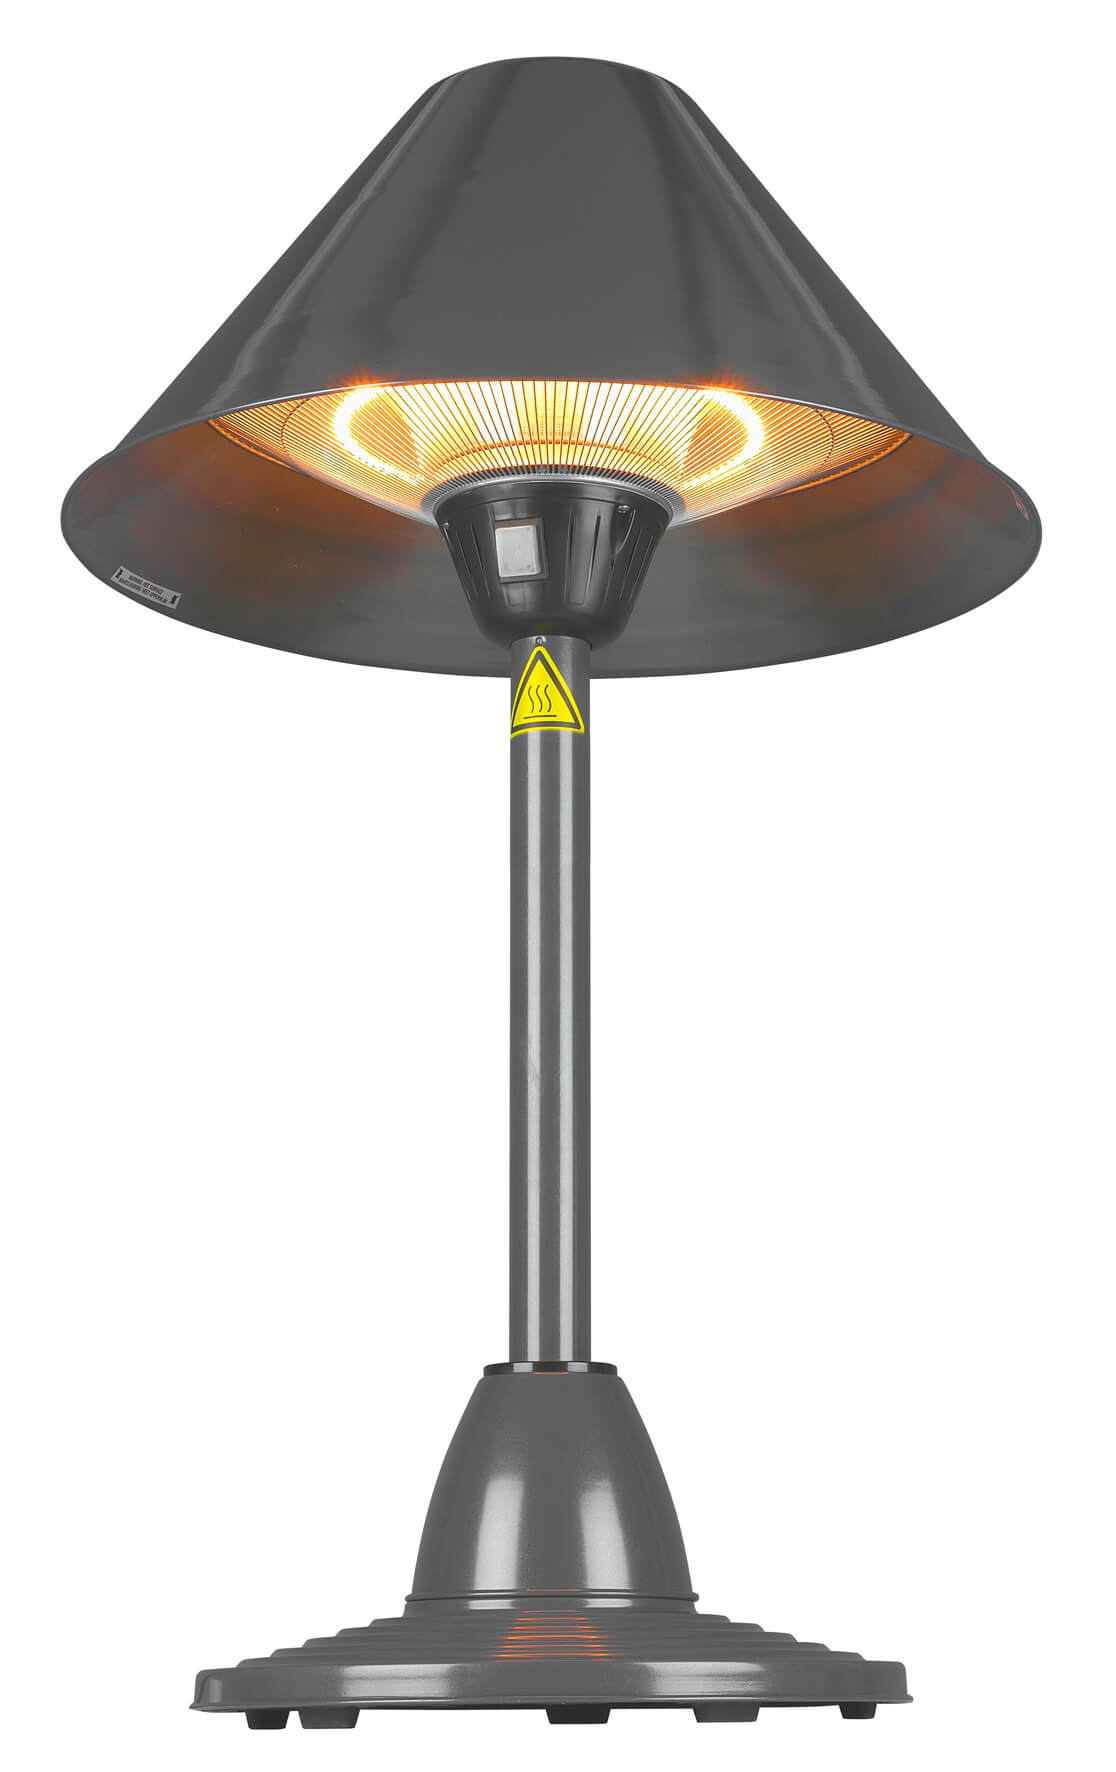 Eurom PD1500T Staande infrarood terrasverwarmer | Tafelmodel